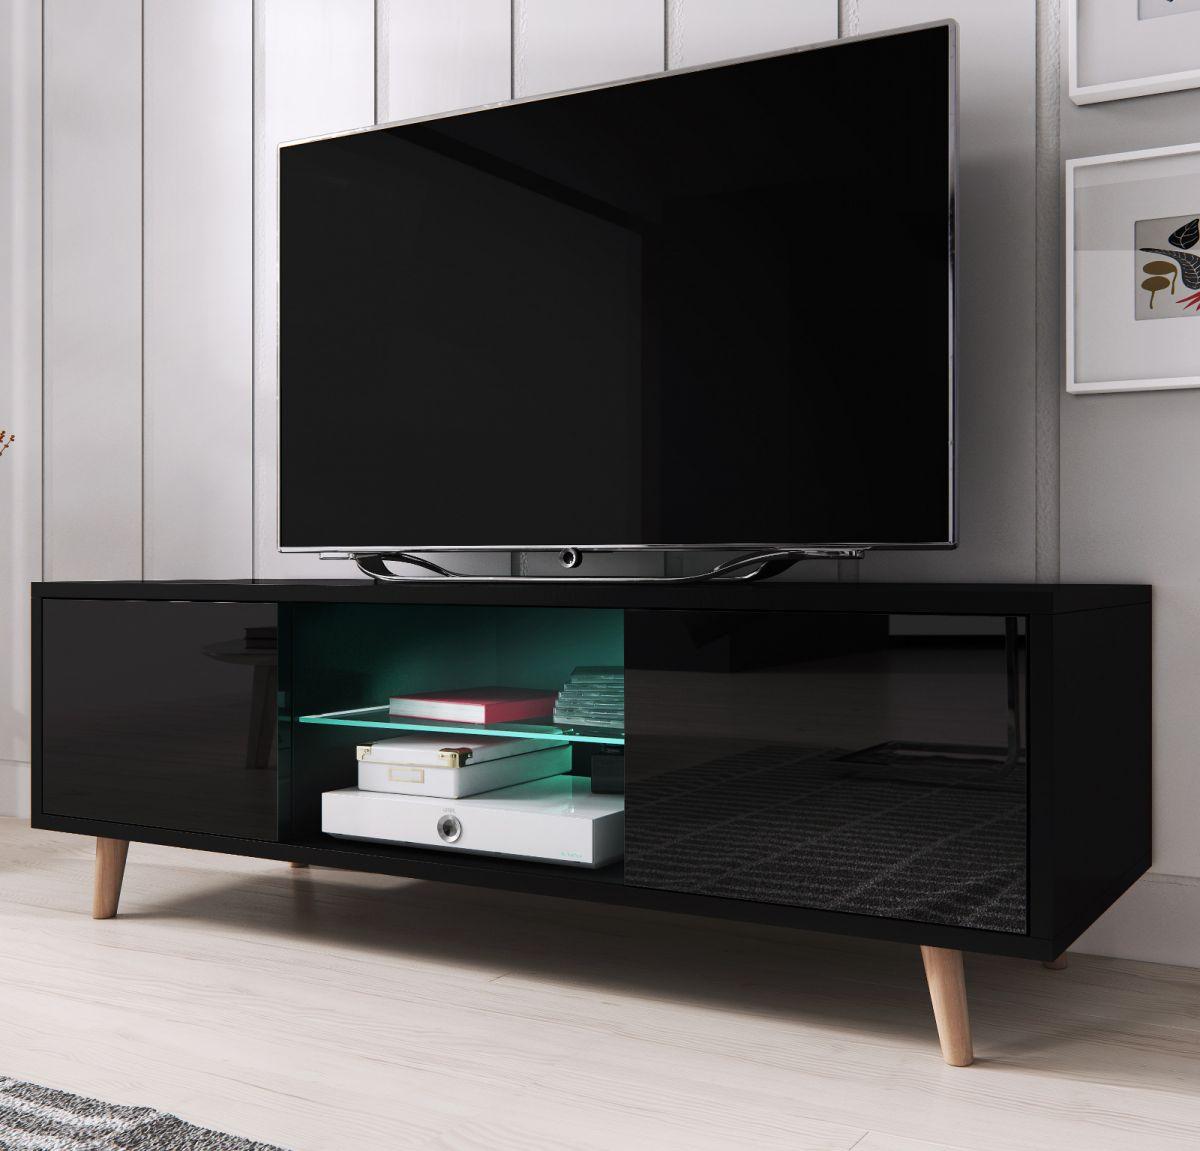 TV-Lowboard Norway-1 Hochglanz schwarz 140 cm